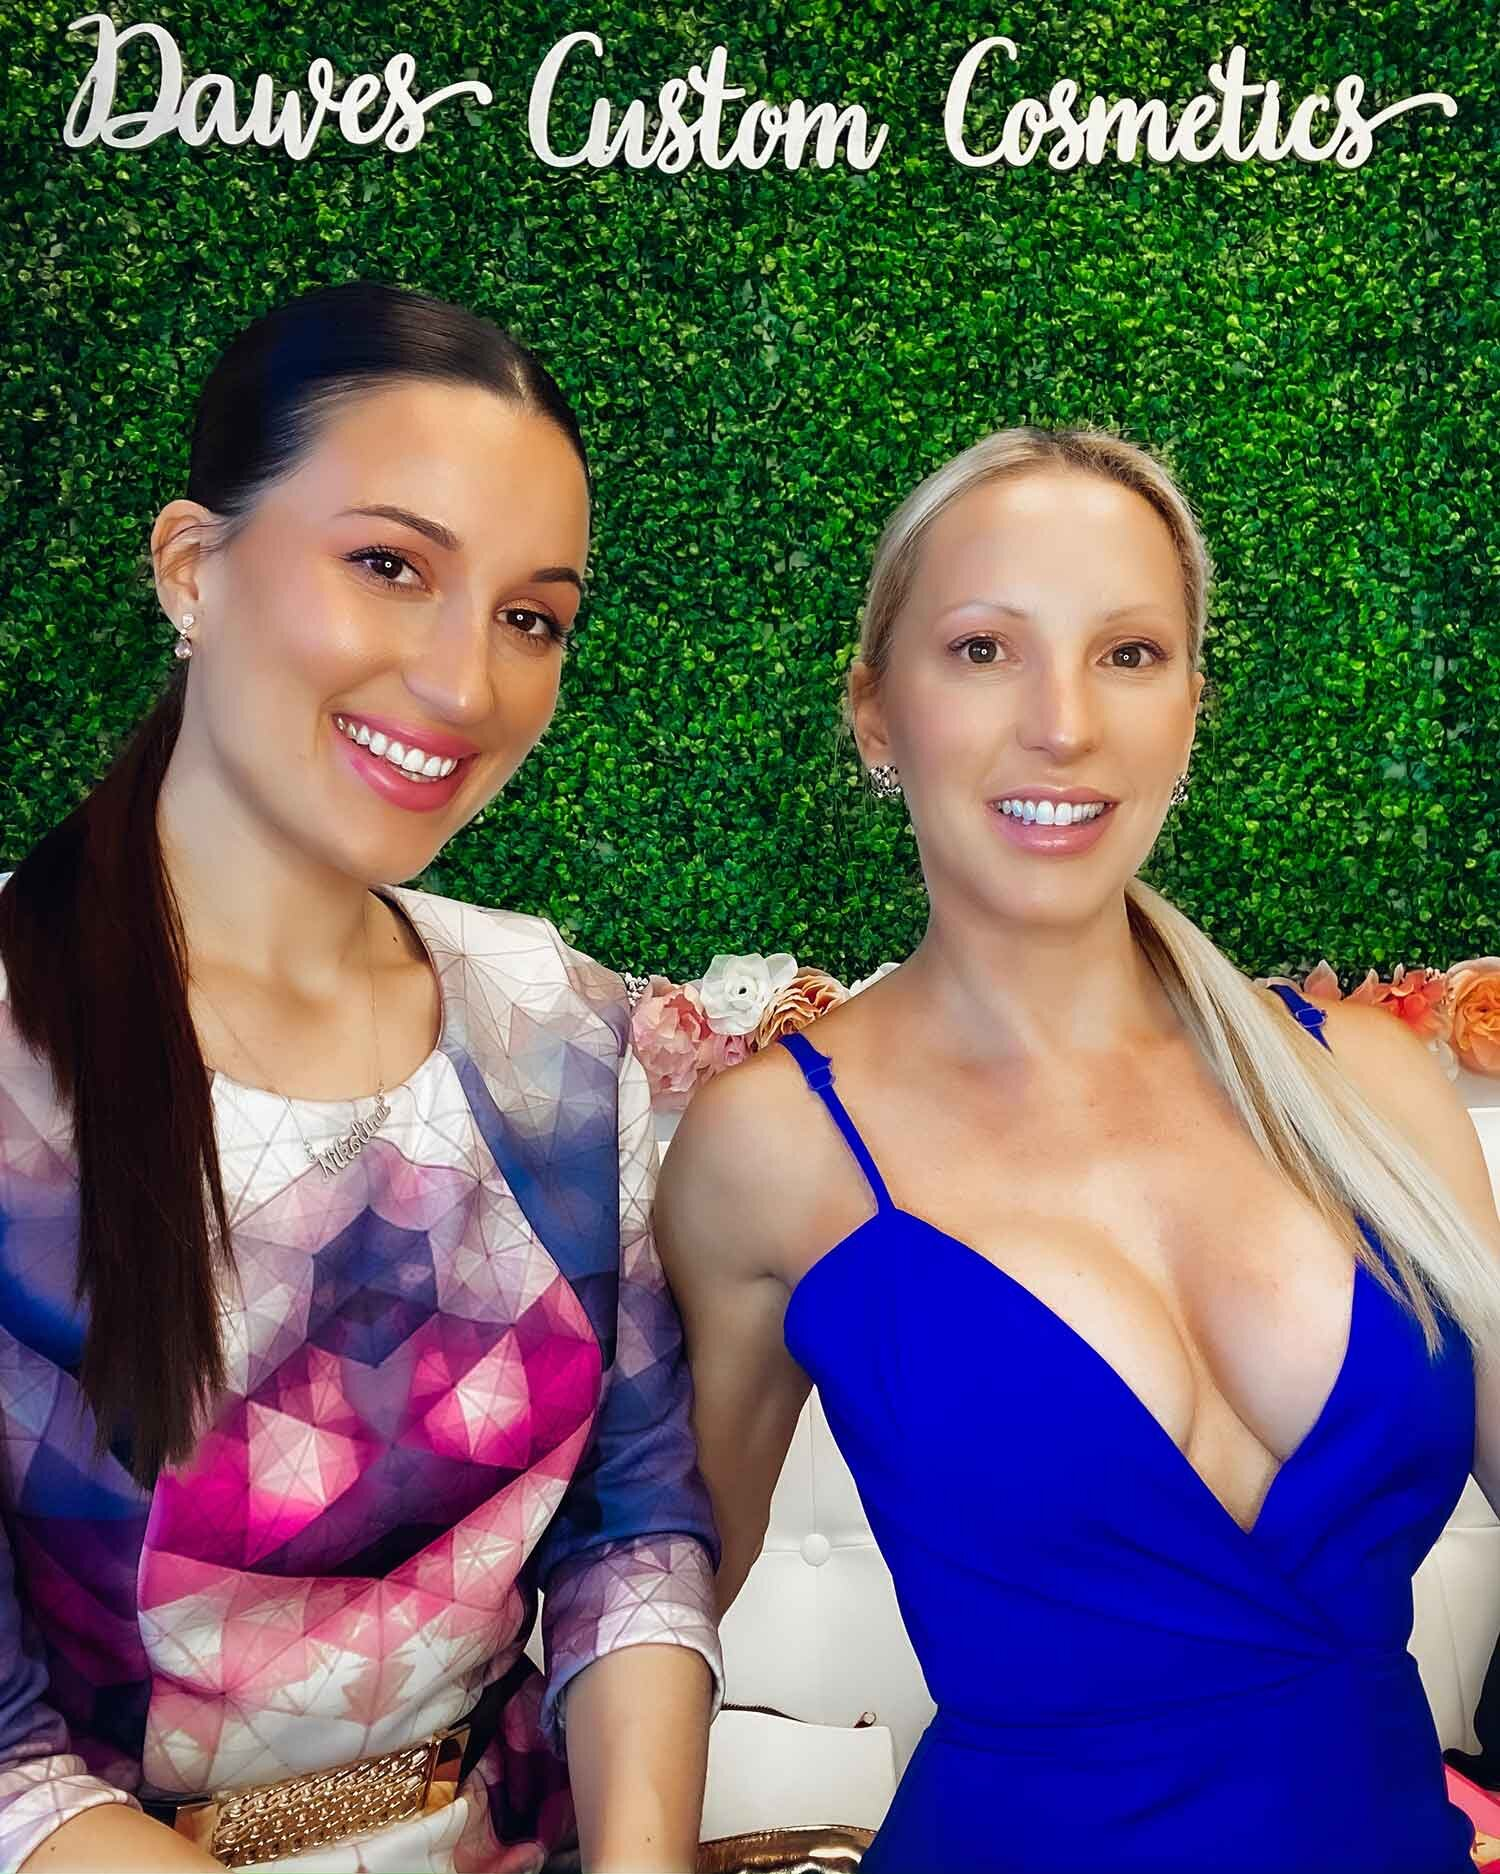 beauty tips Founder Glam sophisticated makeup academy Nikolina Vegas beauty blogger Eve Dawes